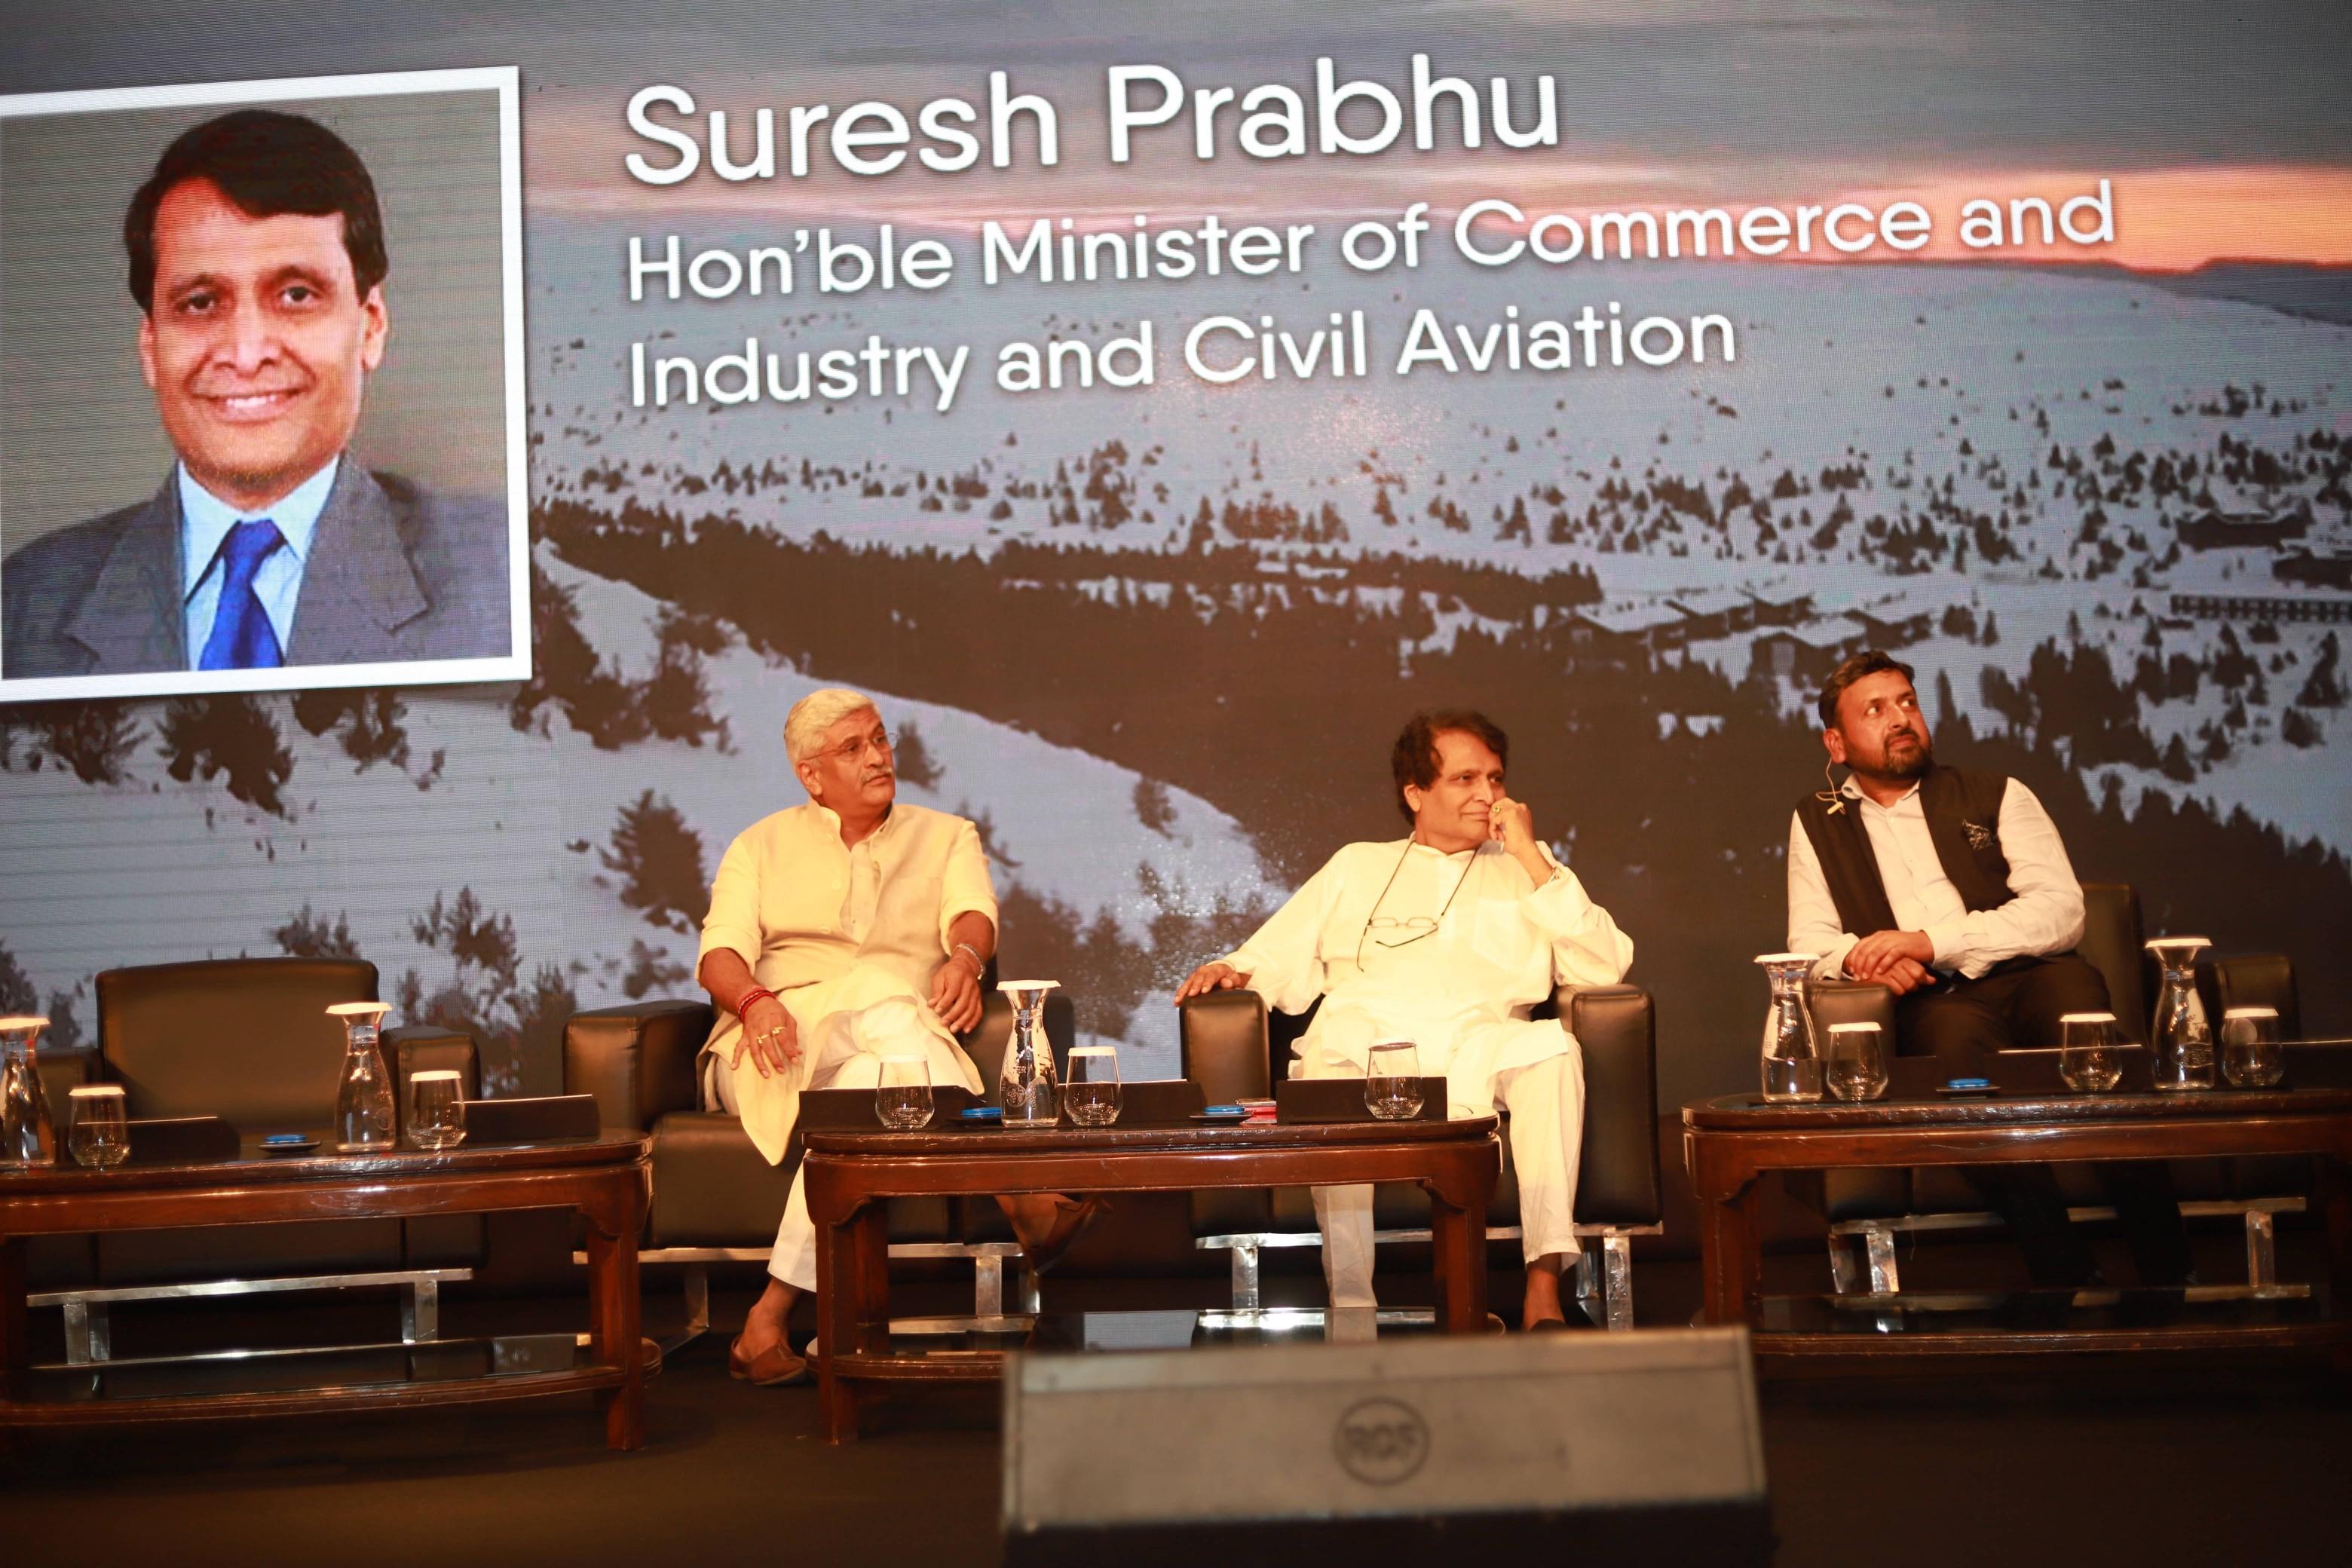 Shailesh Vickram Singh with Gajendra Singh Shekhawat and Suresh Prabhu at Massive Earth Summit.